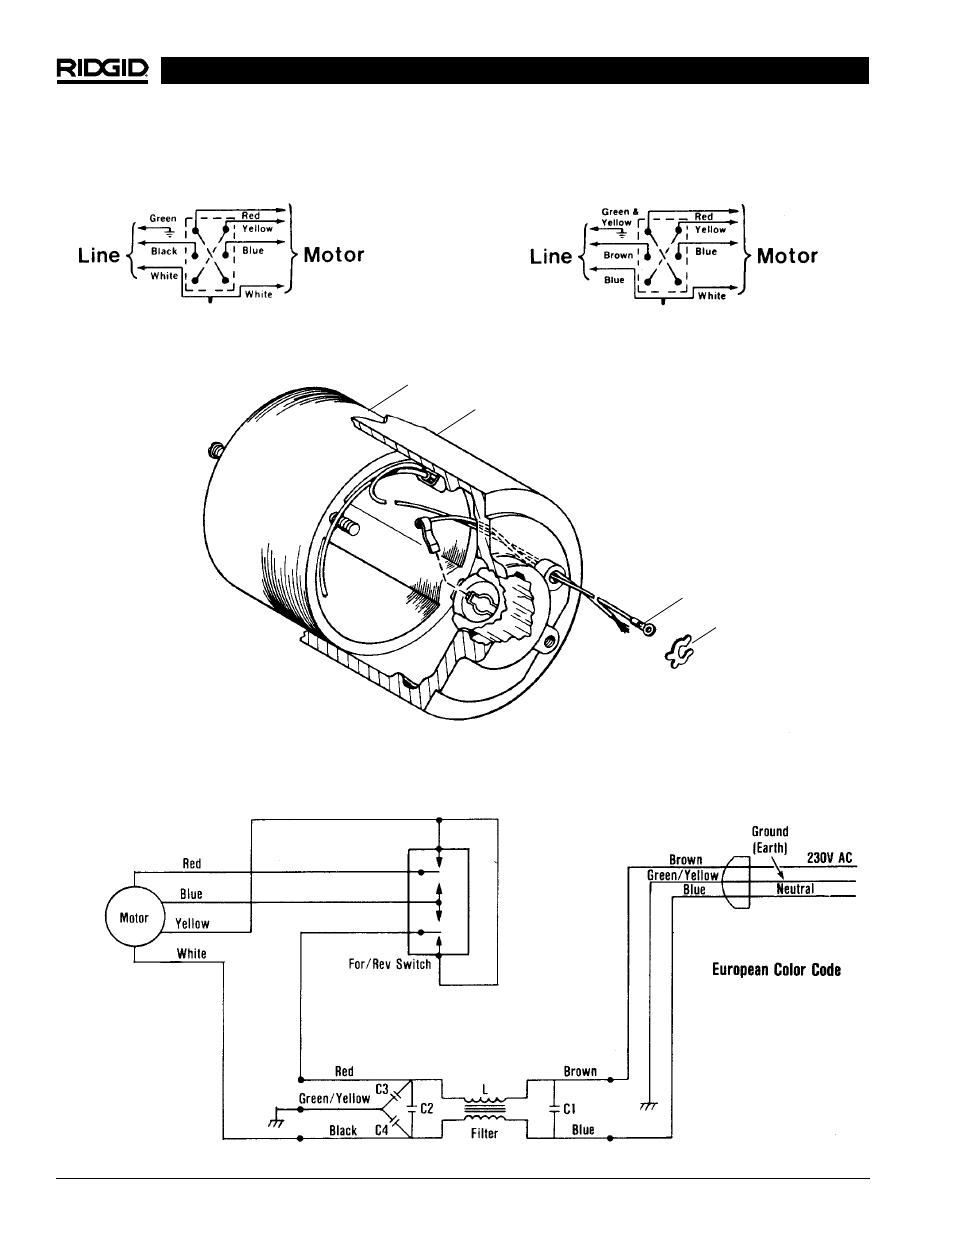 hight resolution of ridgid 4 wire 220v plug wiring diagram